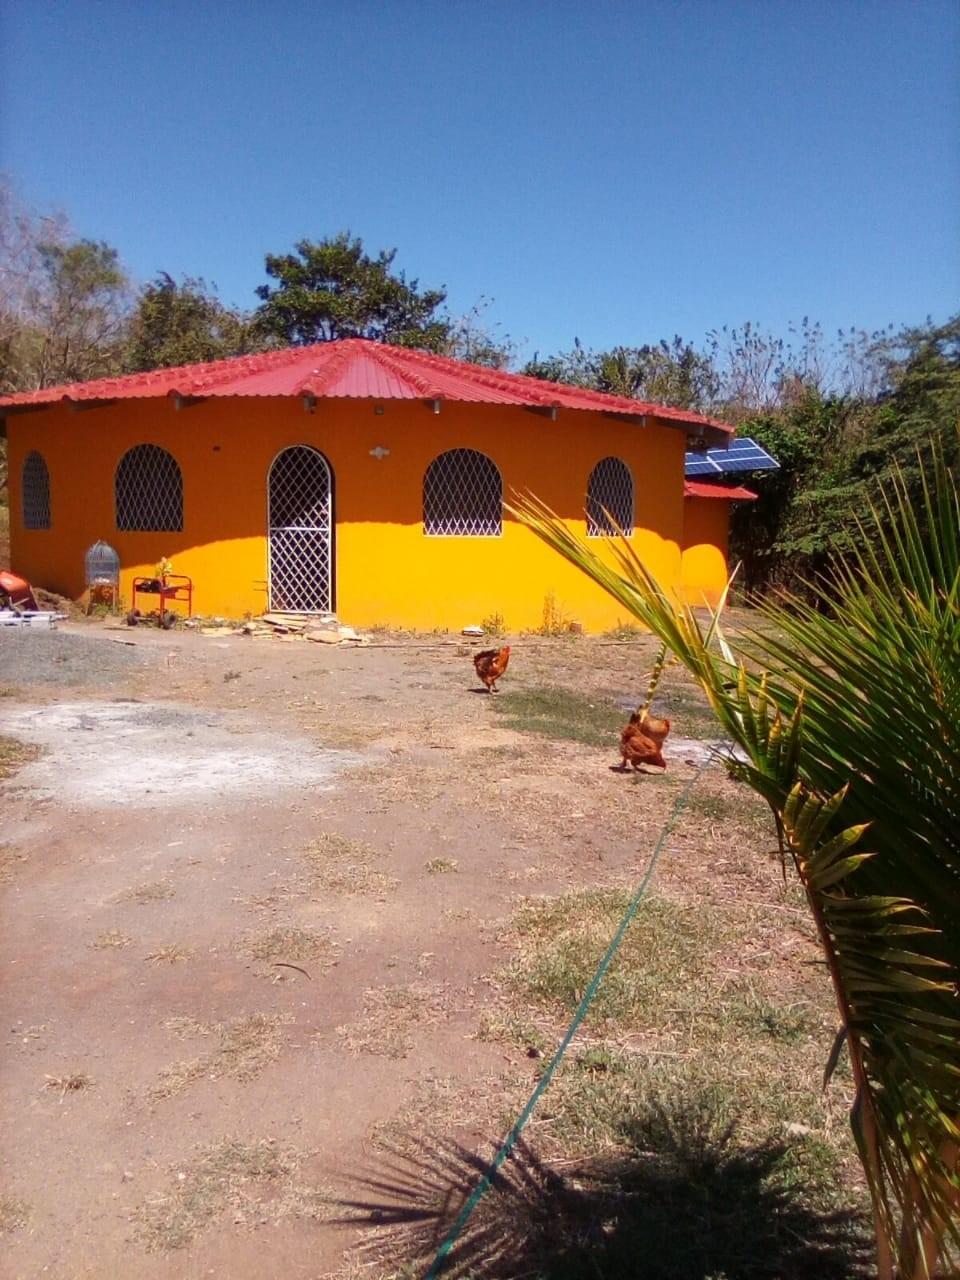 Nicaragua Real Estate dome home for sale in San Juan Del Sur